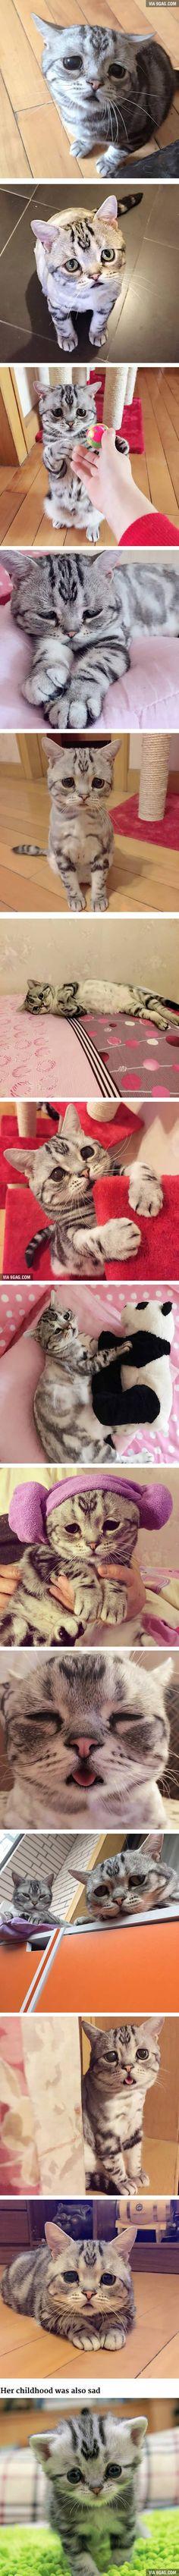 """The Saddest Cat On The Internet"""